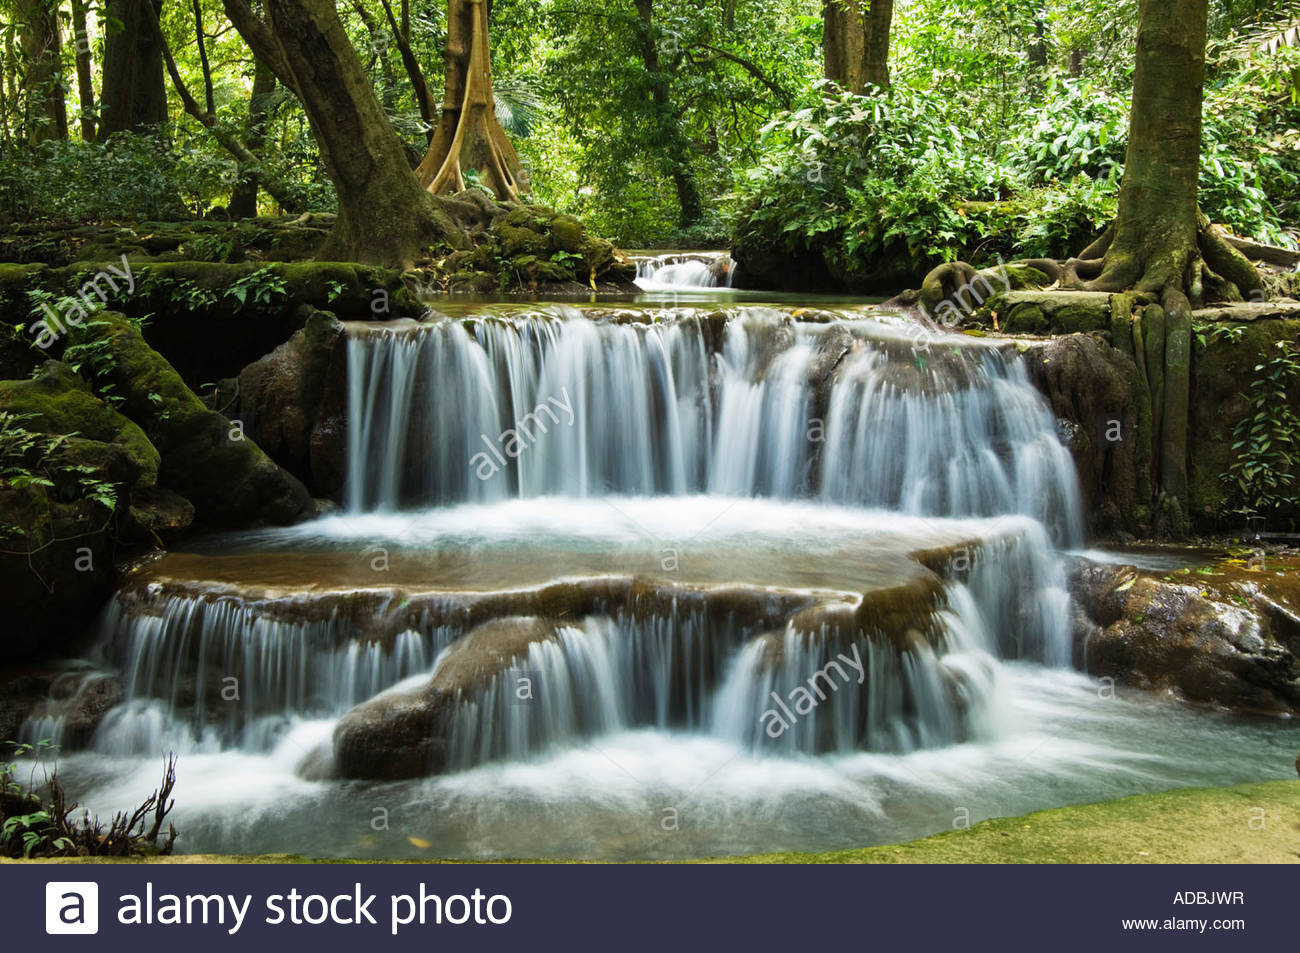 Animated Waterfalls Wallpapers Free Download Tropical Rainforest Waterfall Krabi Thailand Stock Photo